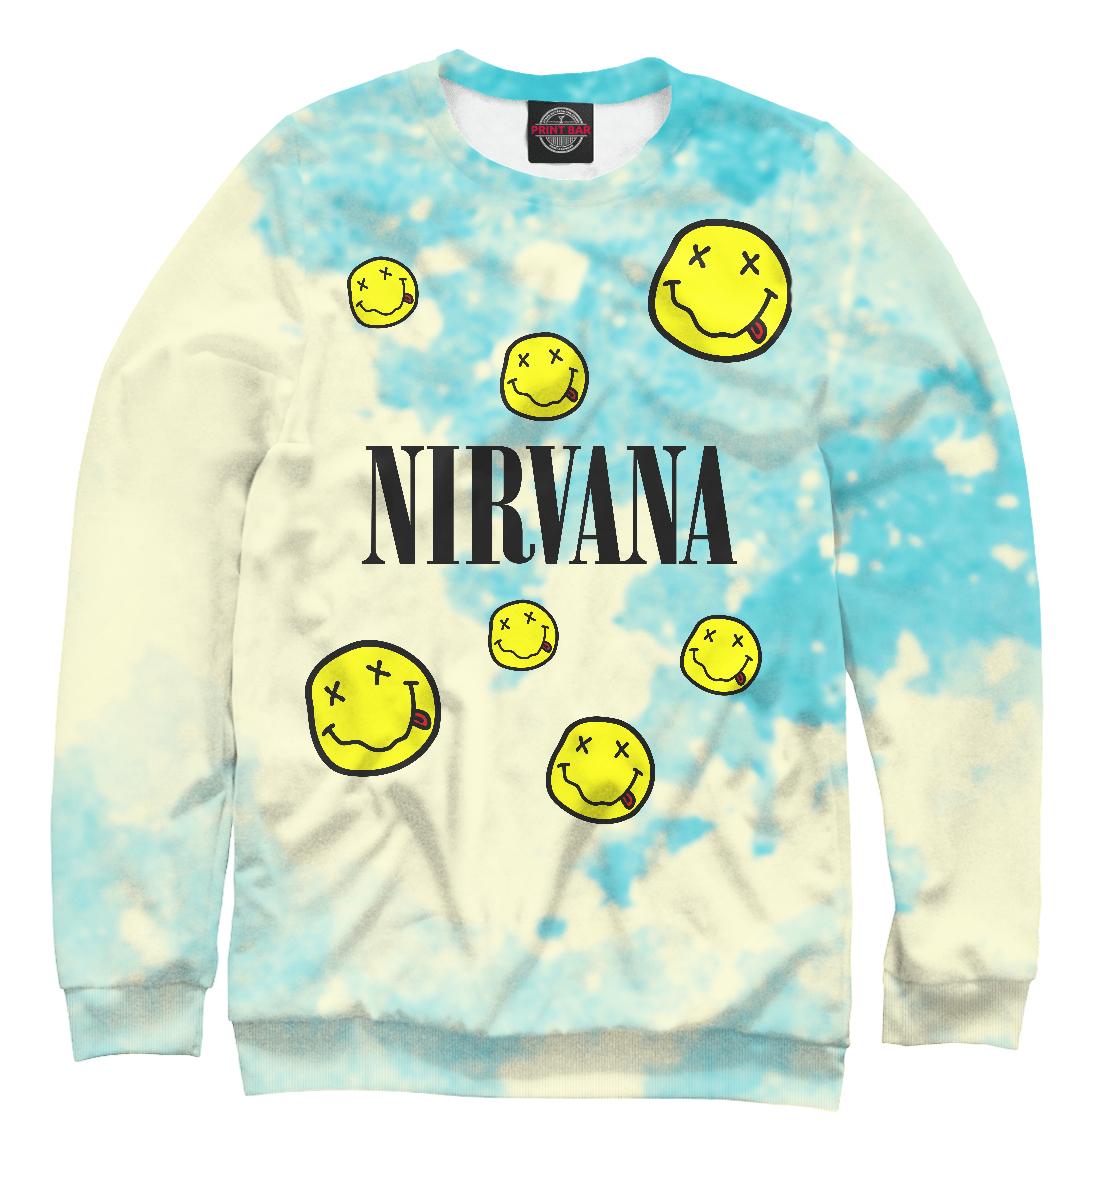 Купить Nirvana, Printbar, Свитшоты, NIR-301816-swi-1